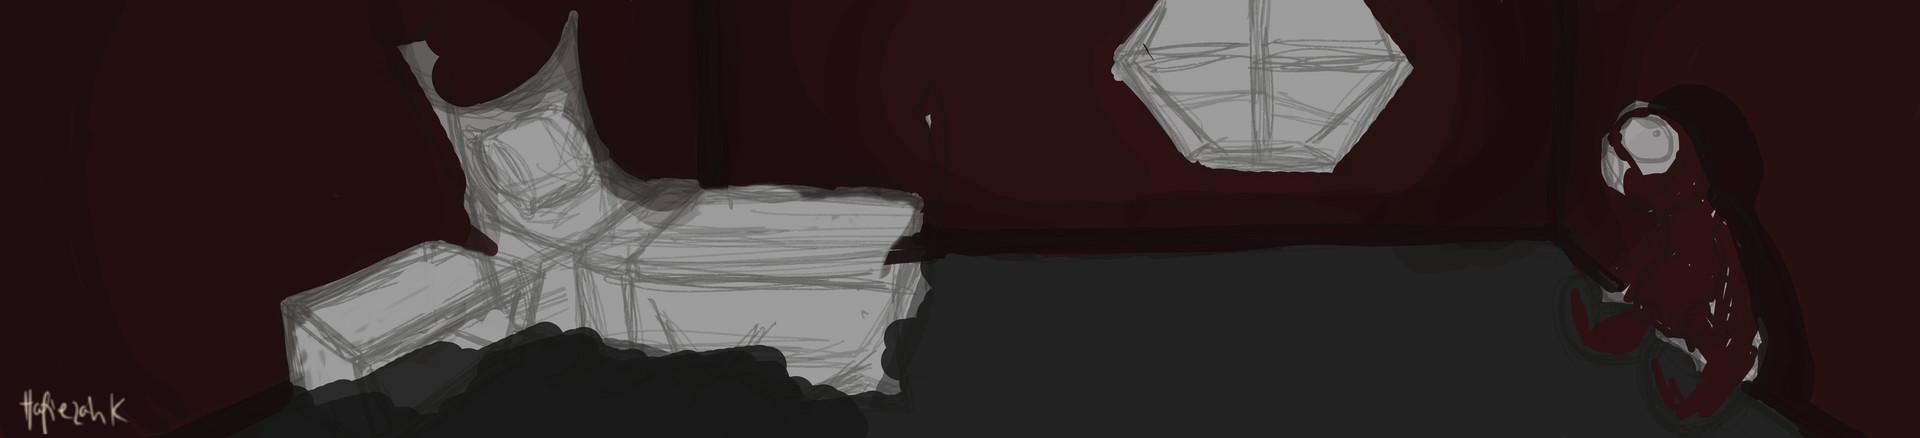 Sketch Hafiezah Kahil Scene2 2